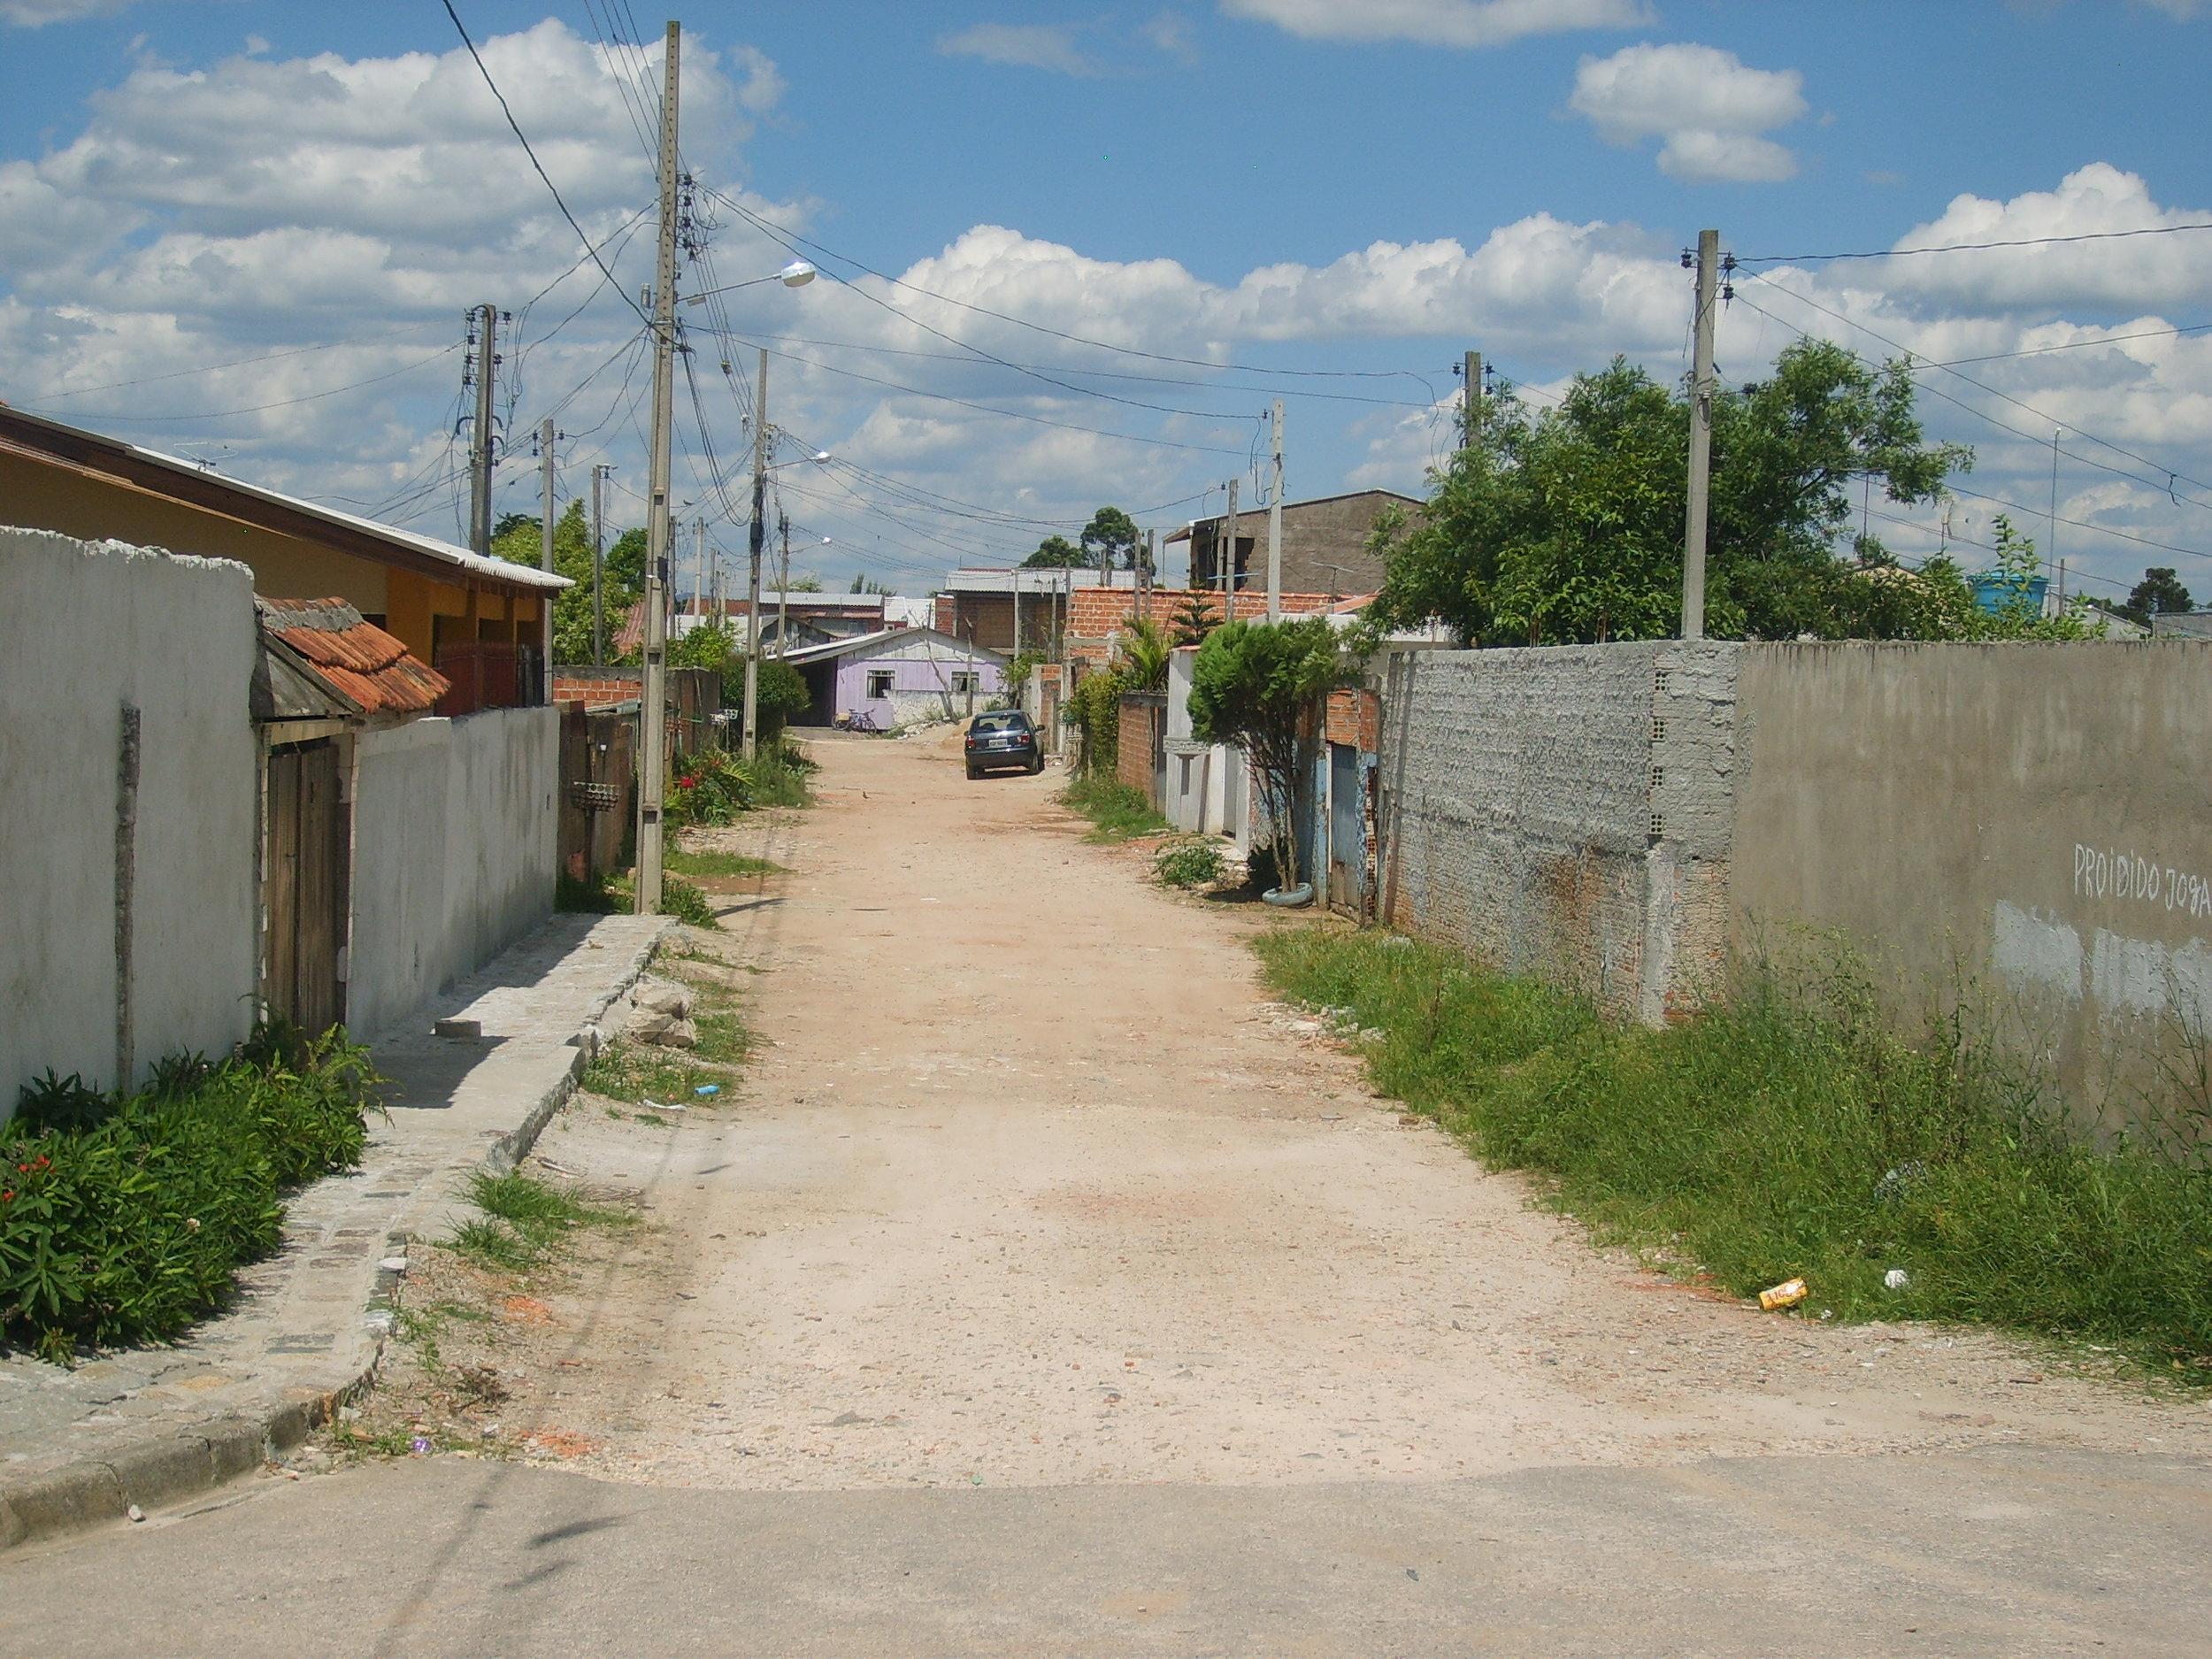 Rua Josefina Simoes Alves Vl Sao Domingos antes.JPG